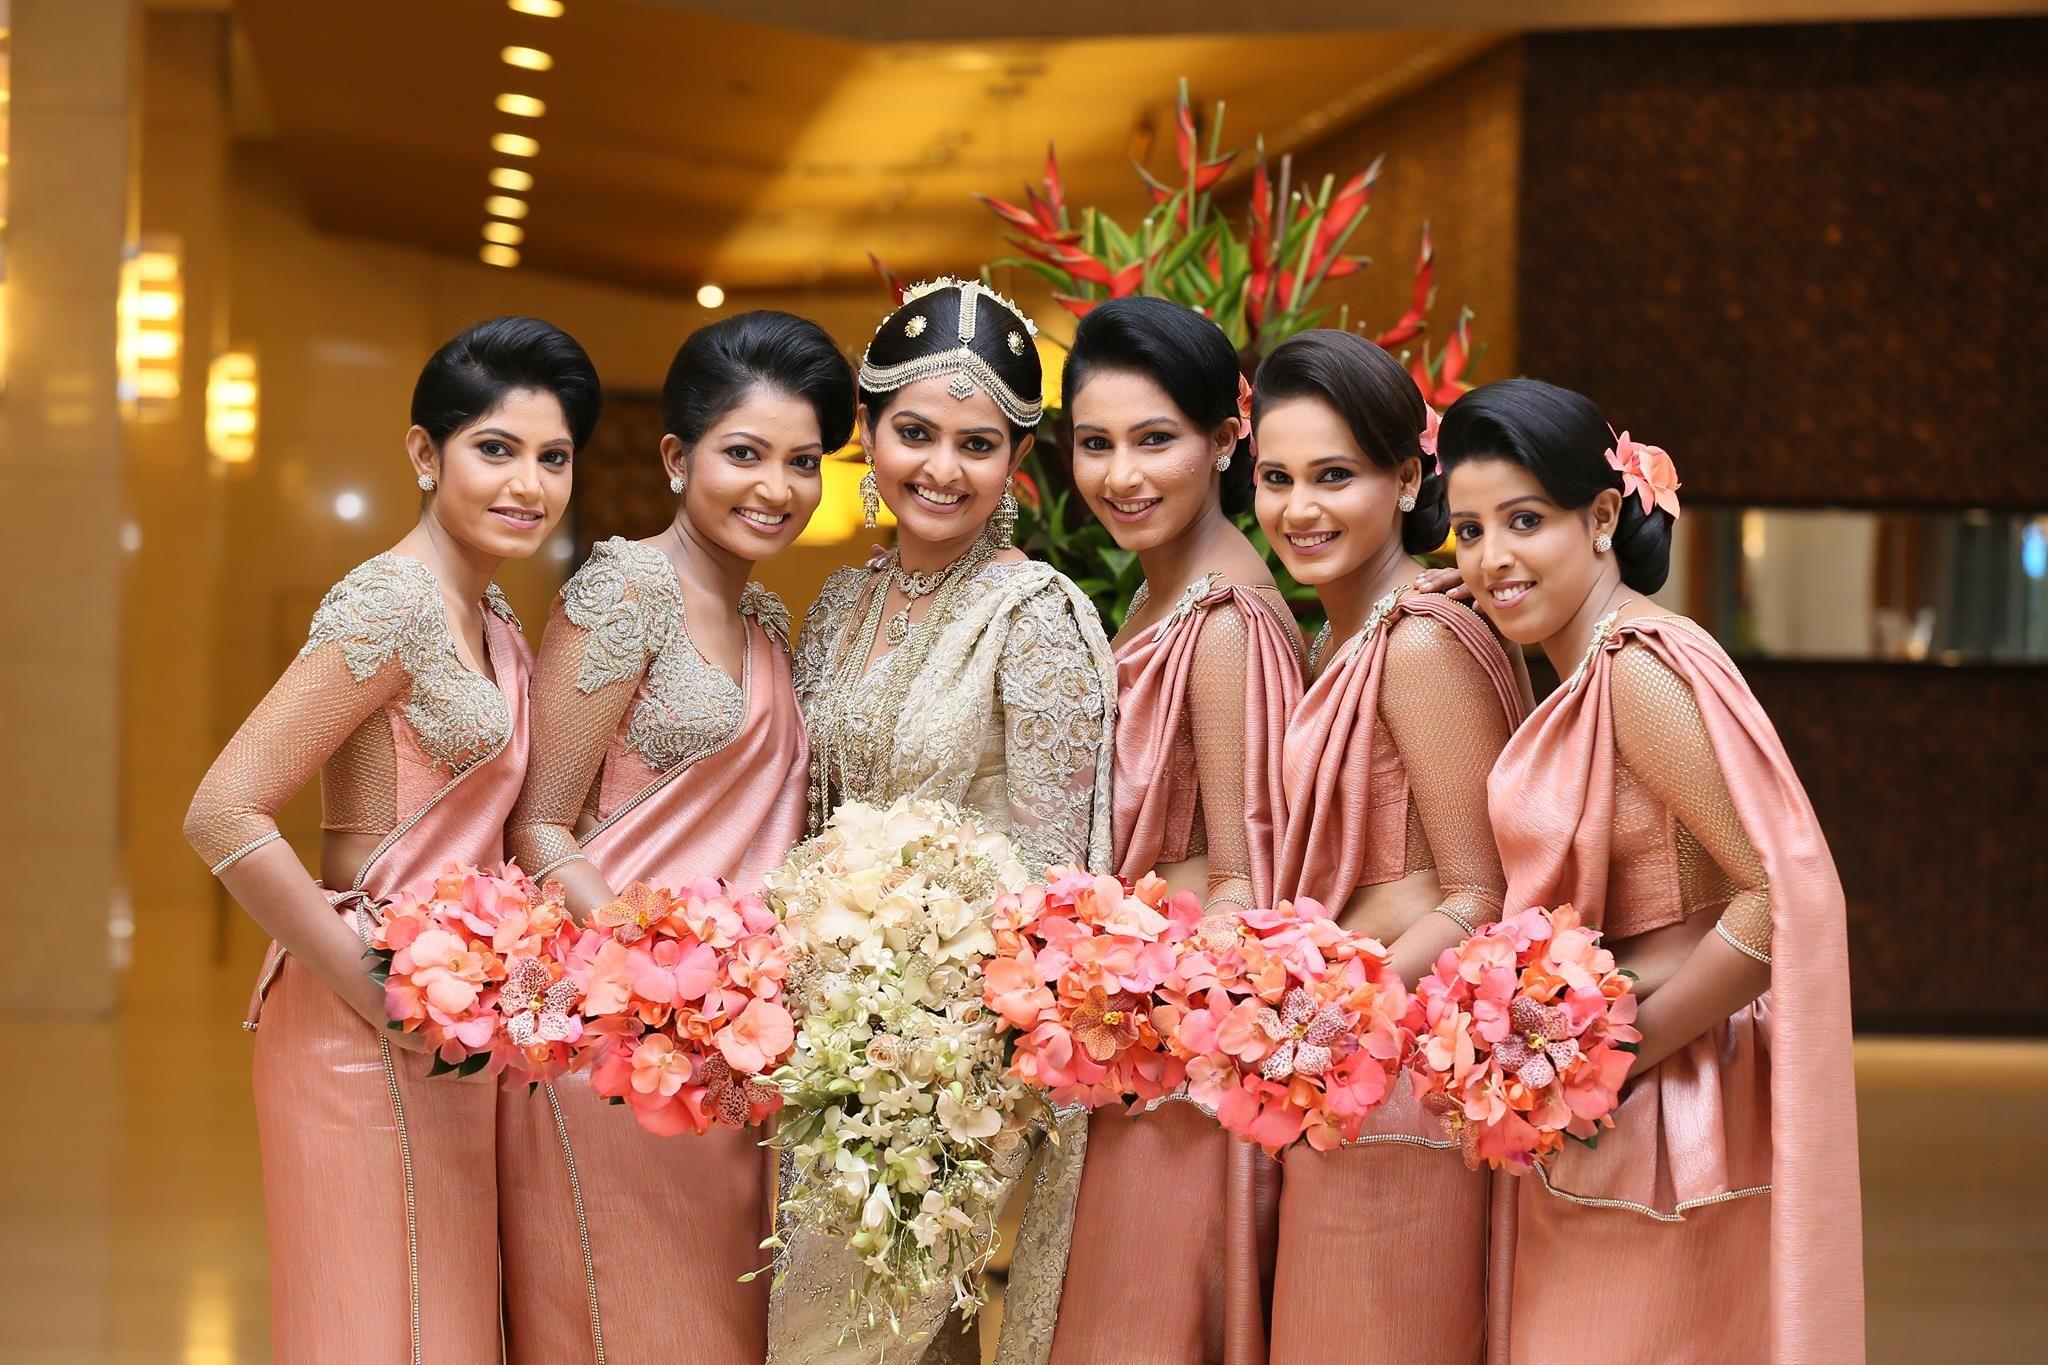 Love dresses by dhananjaya for Wedding party dresses in sri lanka